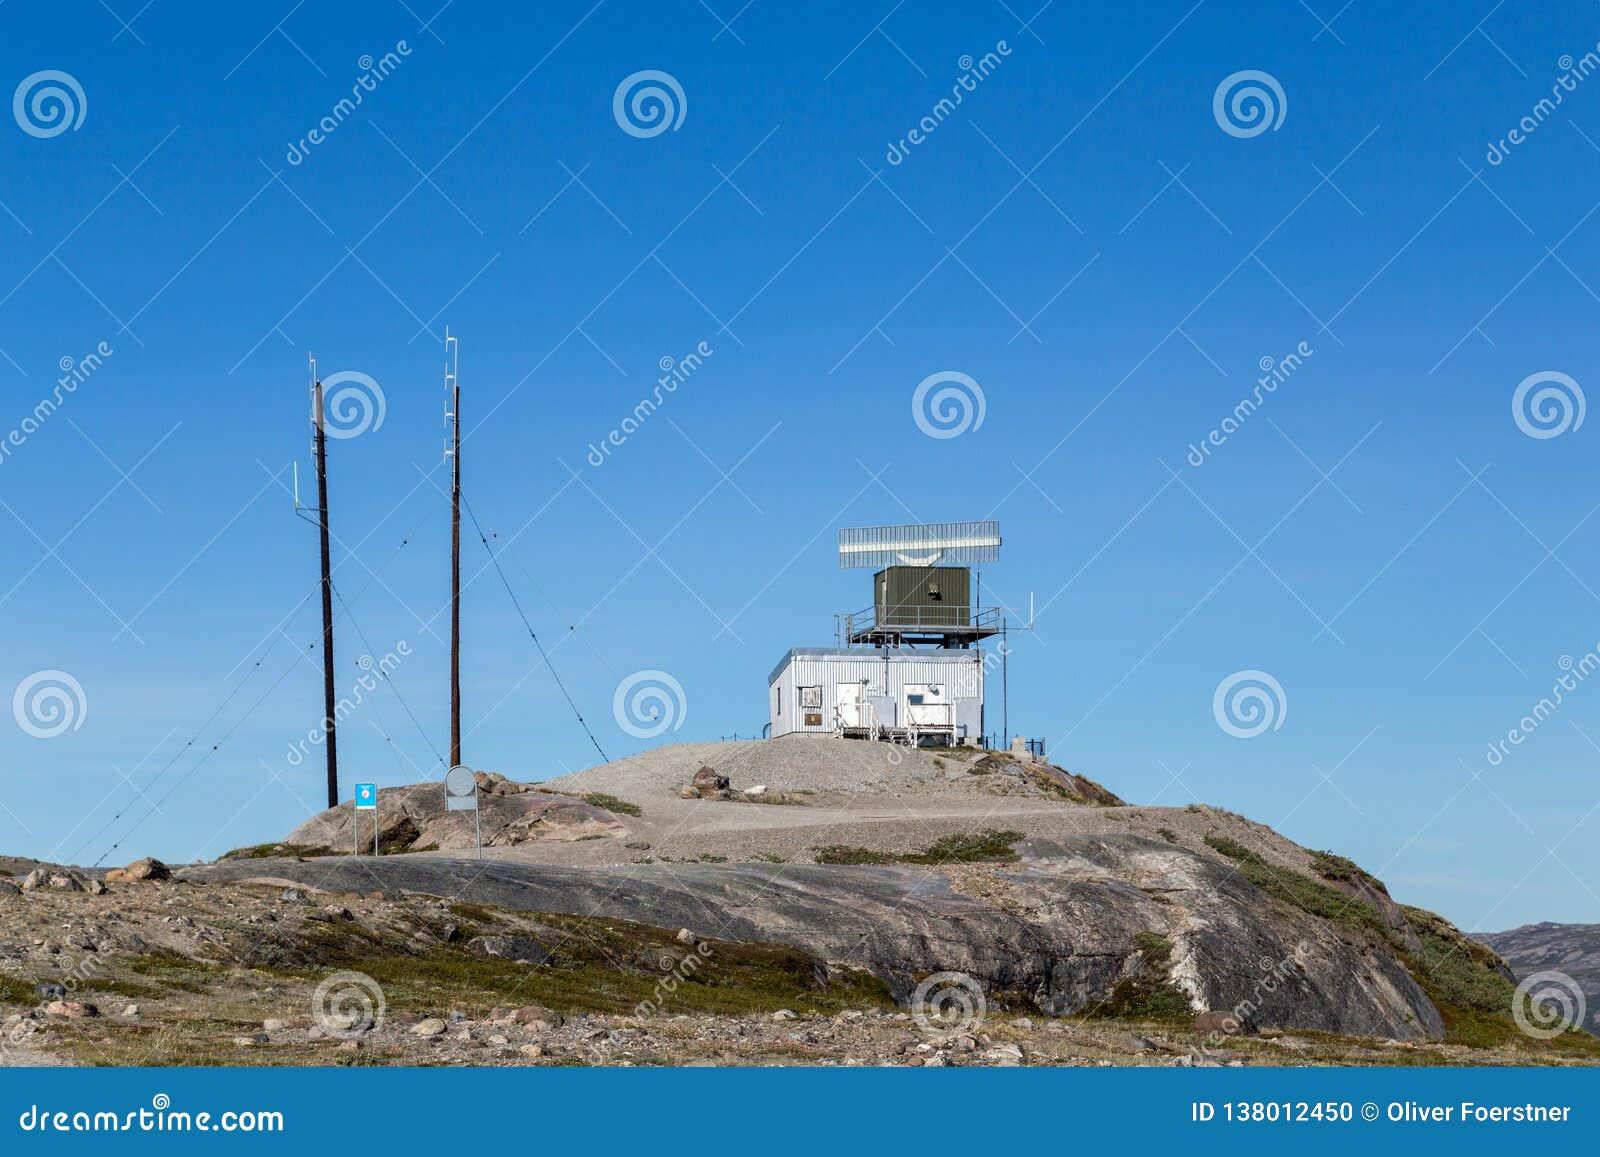 Radar Tower Station in Kangerlussuaq, Greenland